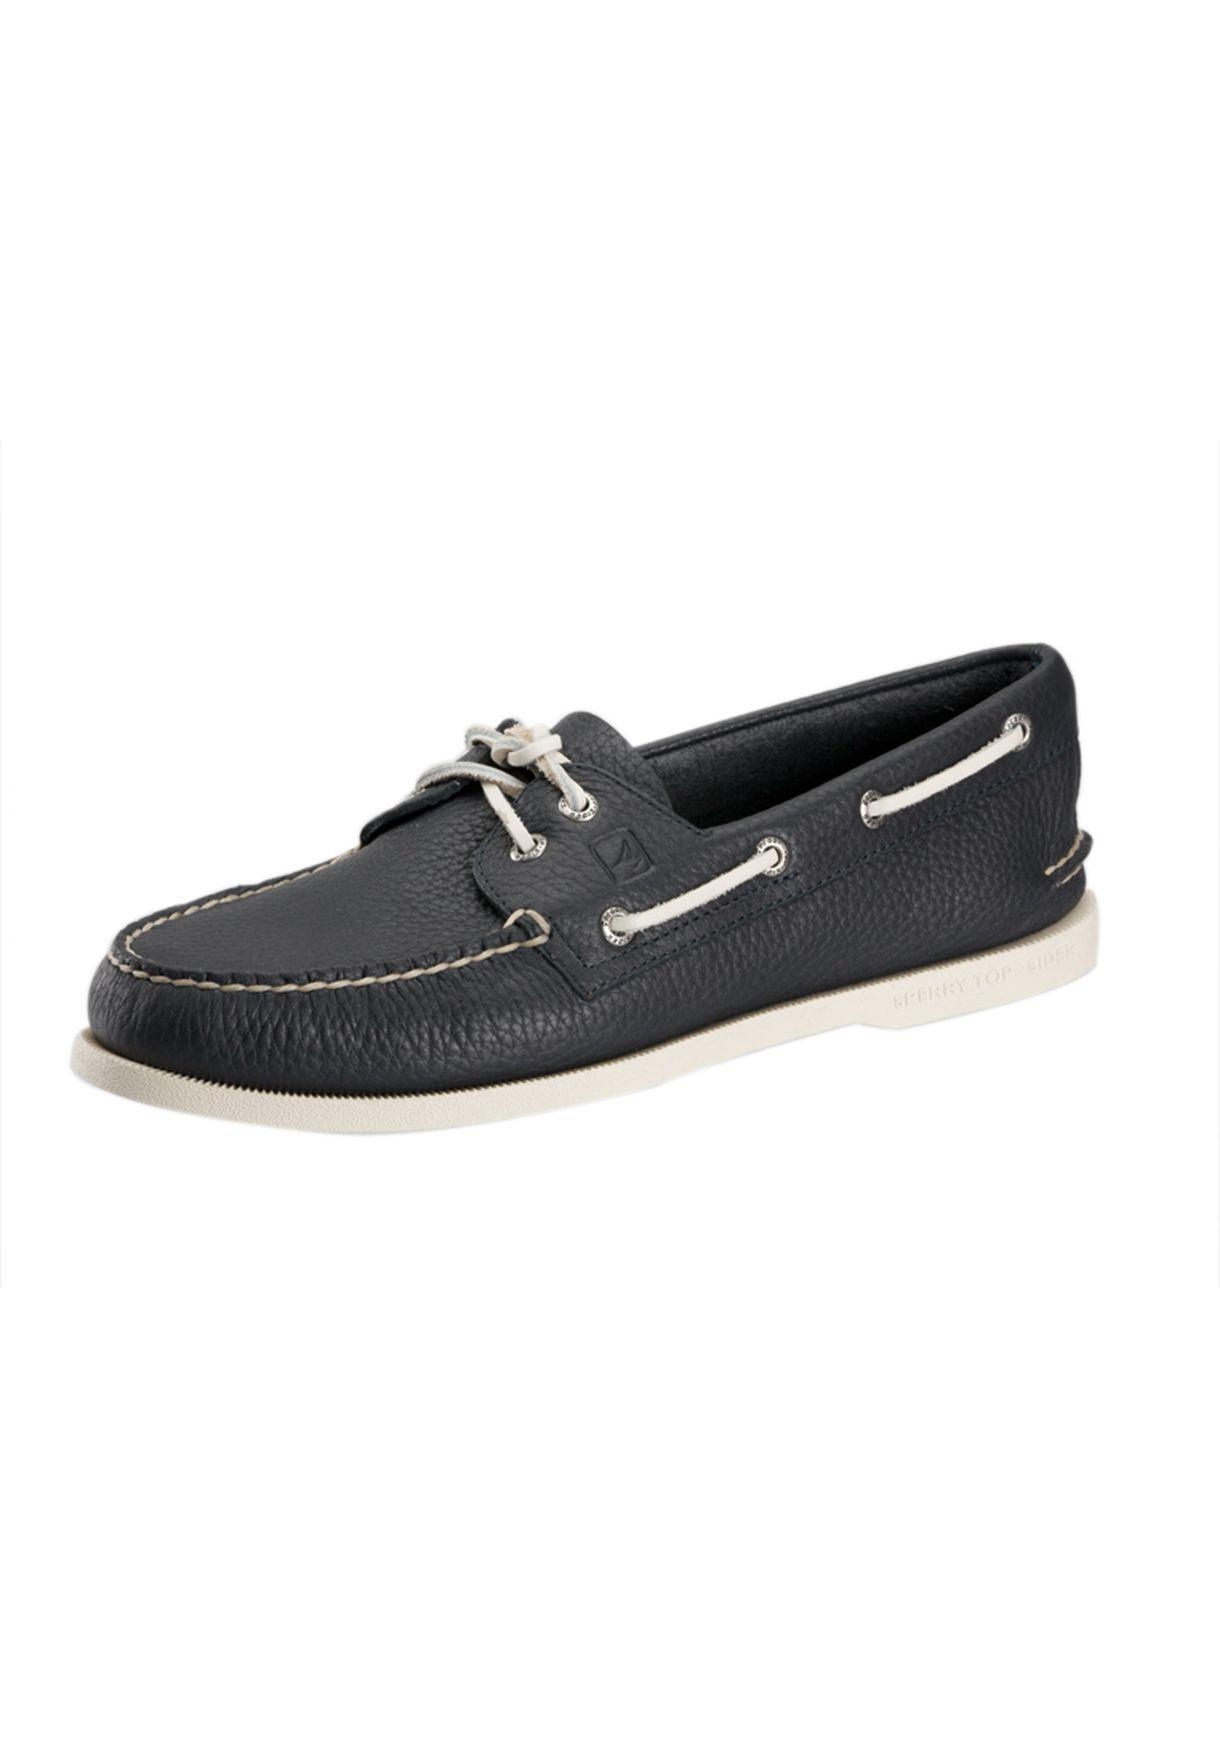 ce858ef16 تسوق Leather Slipons ماركة سبيري توب سايدر لون أزرق في السعودية ...